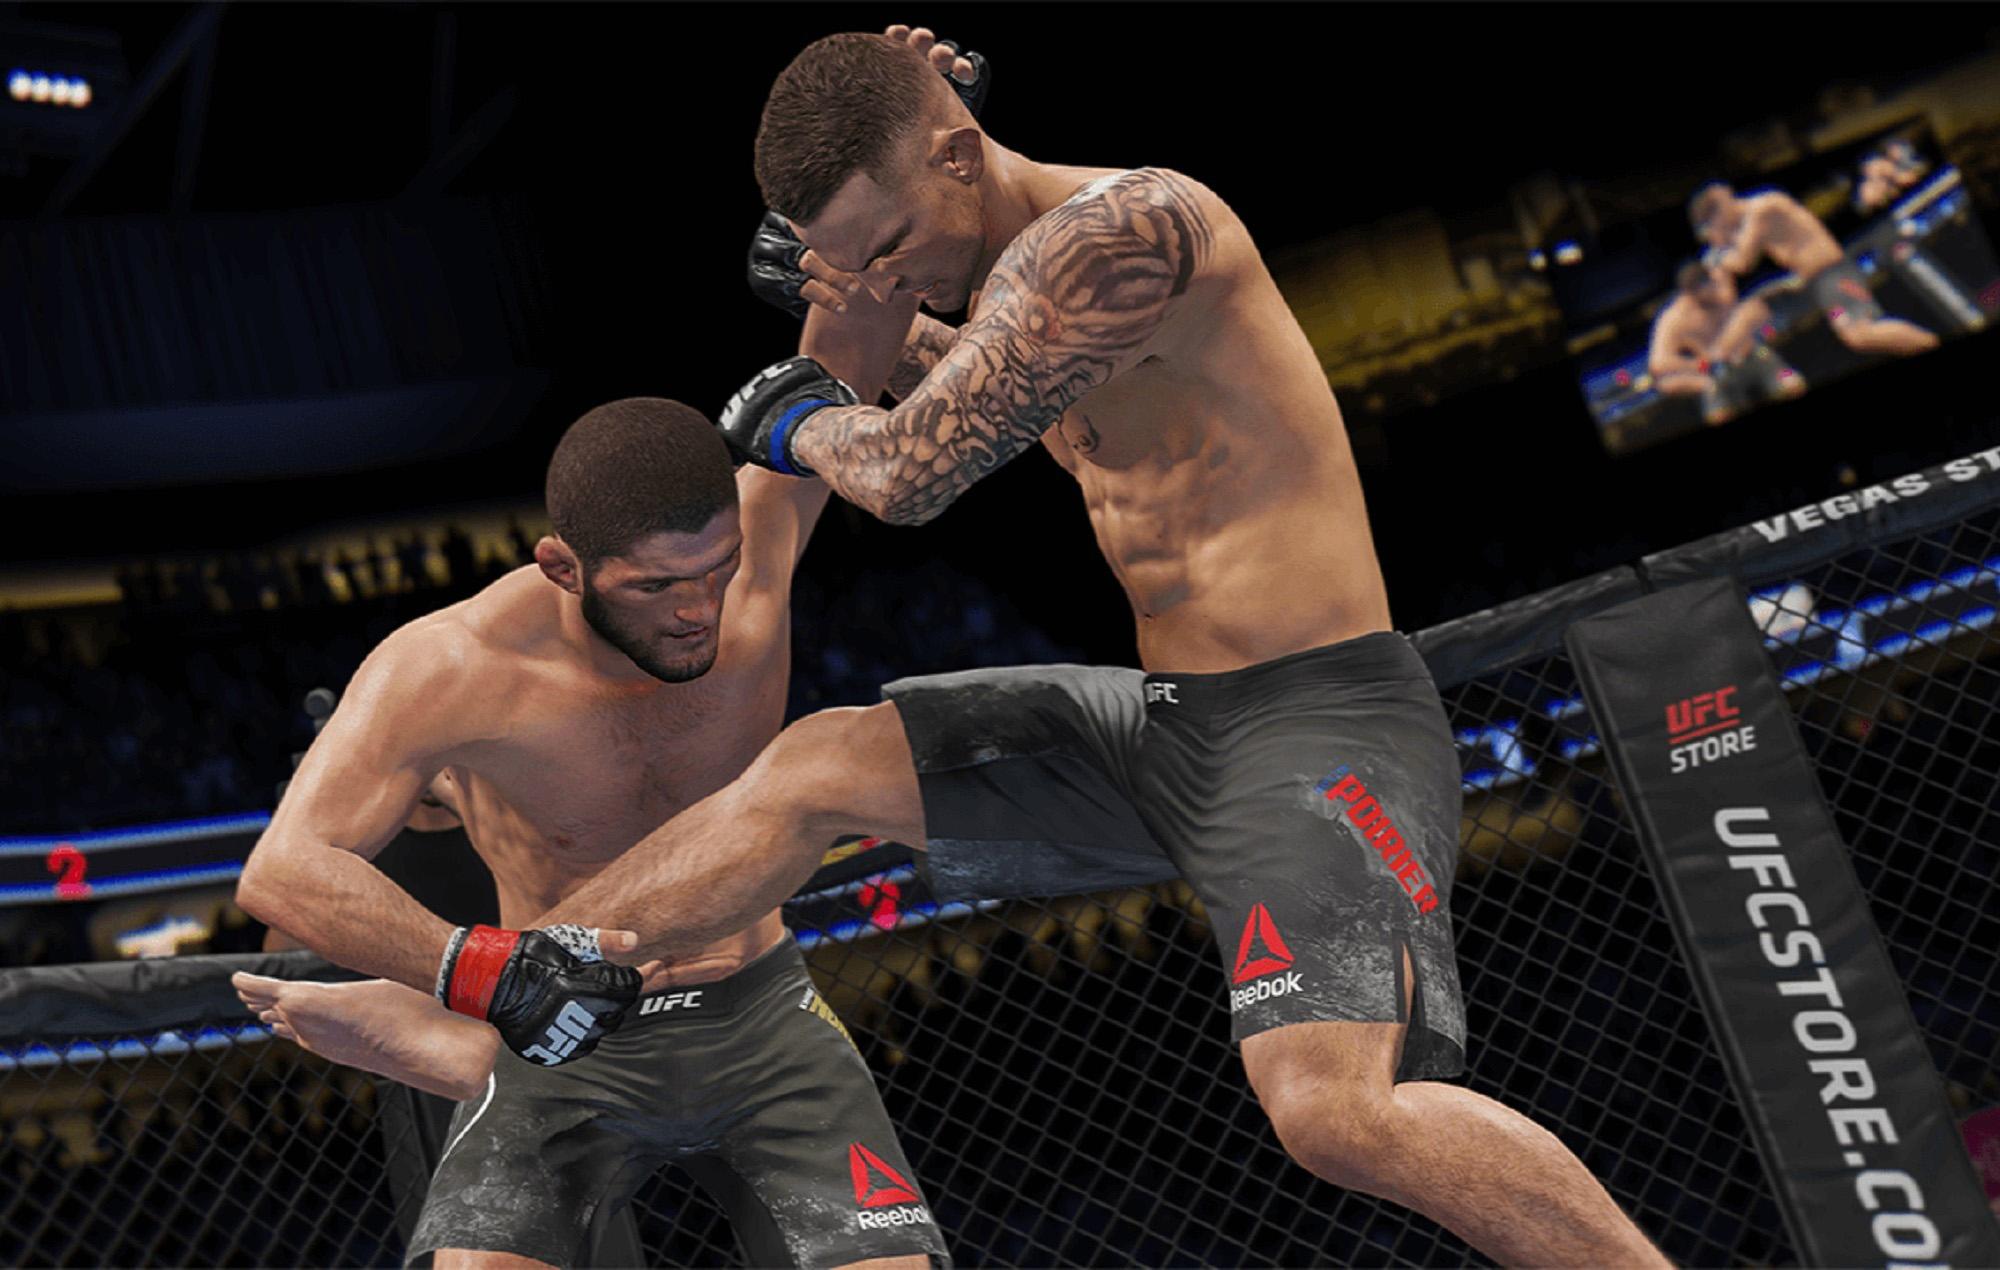 UFC 5 Release Date